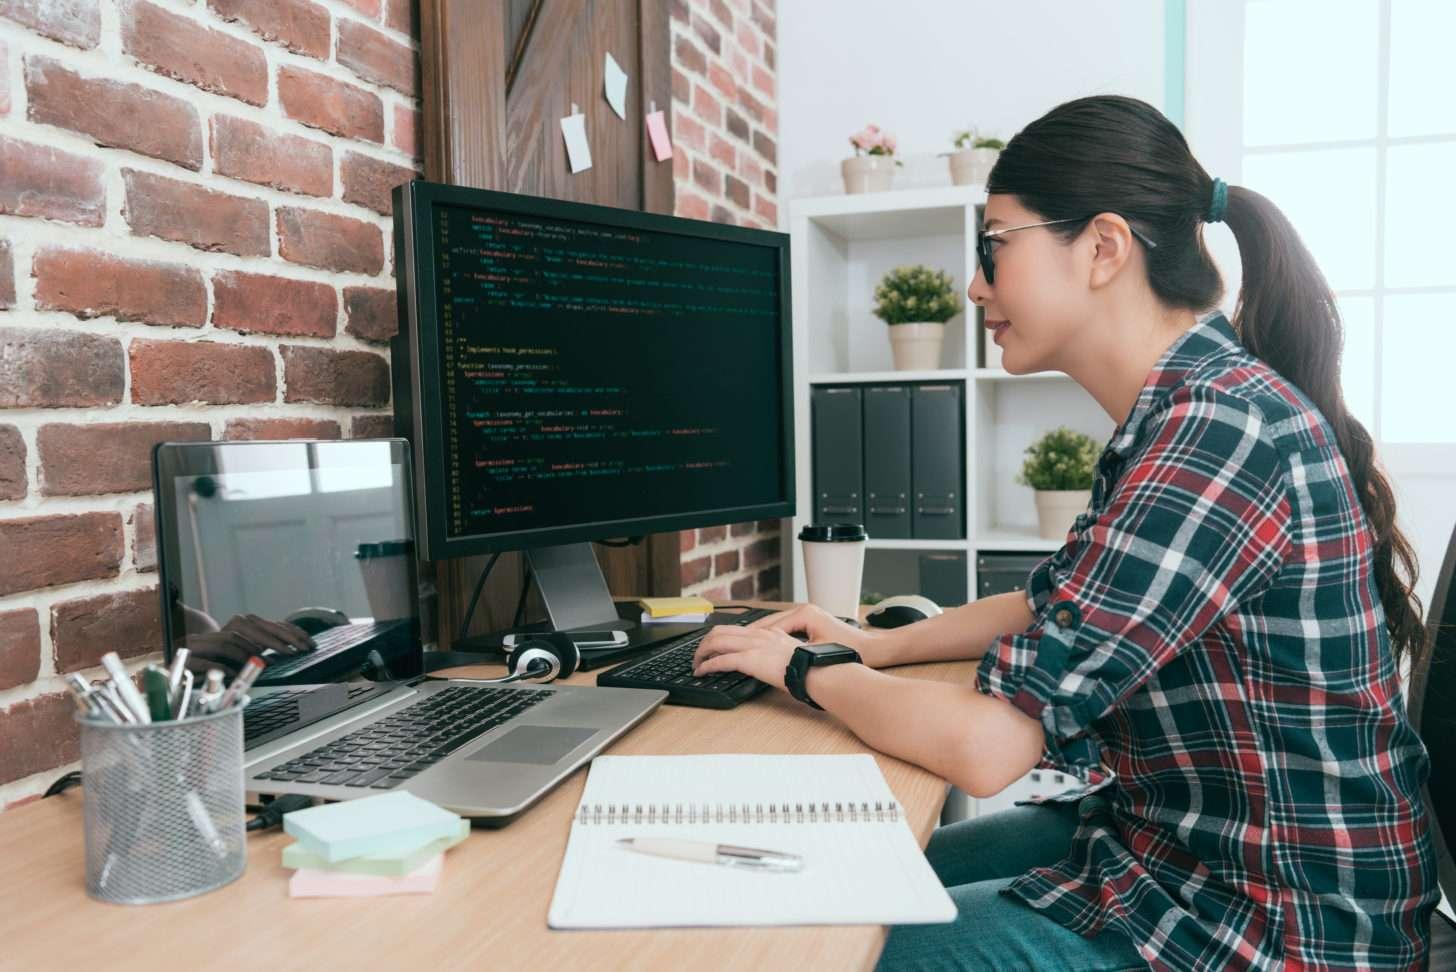 Software developer computer science jobs